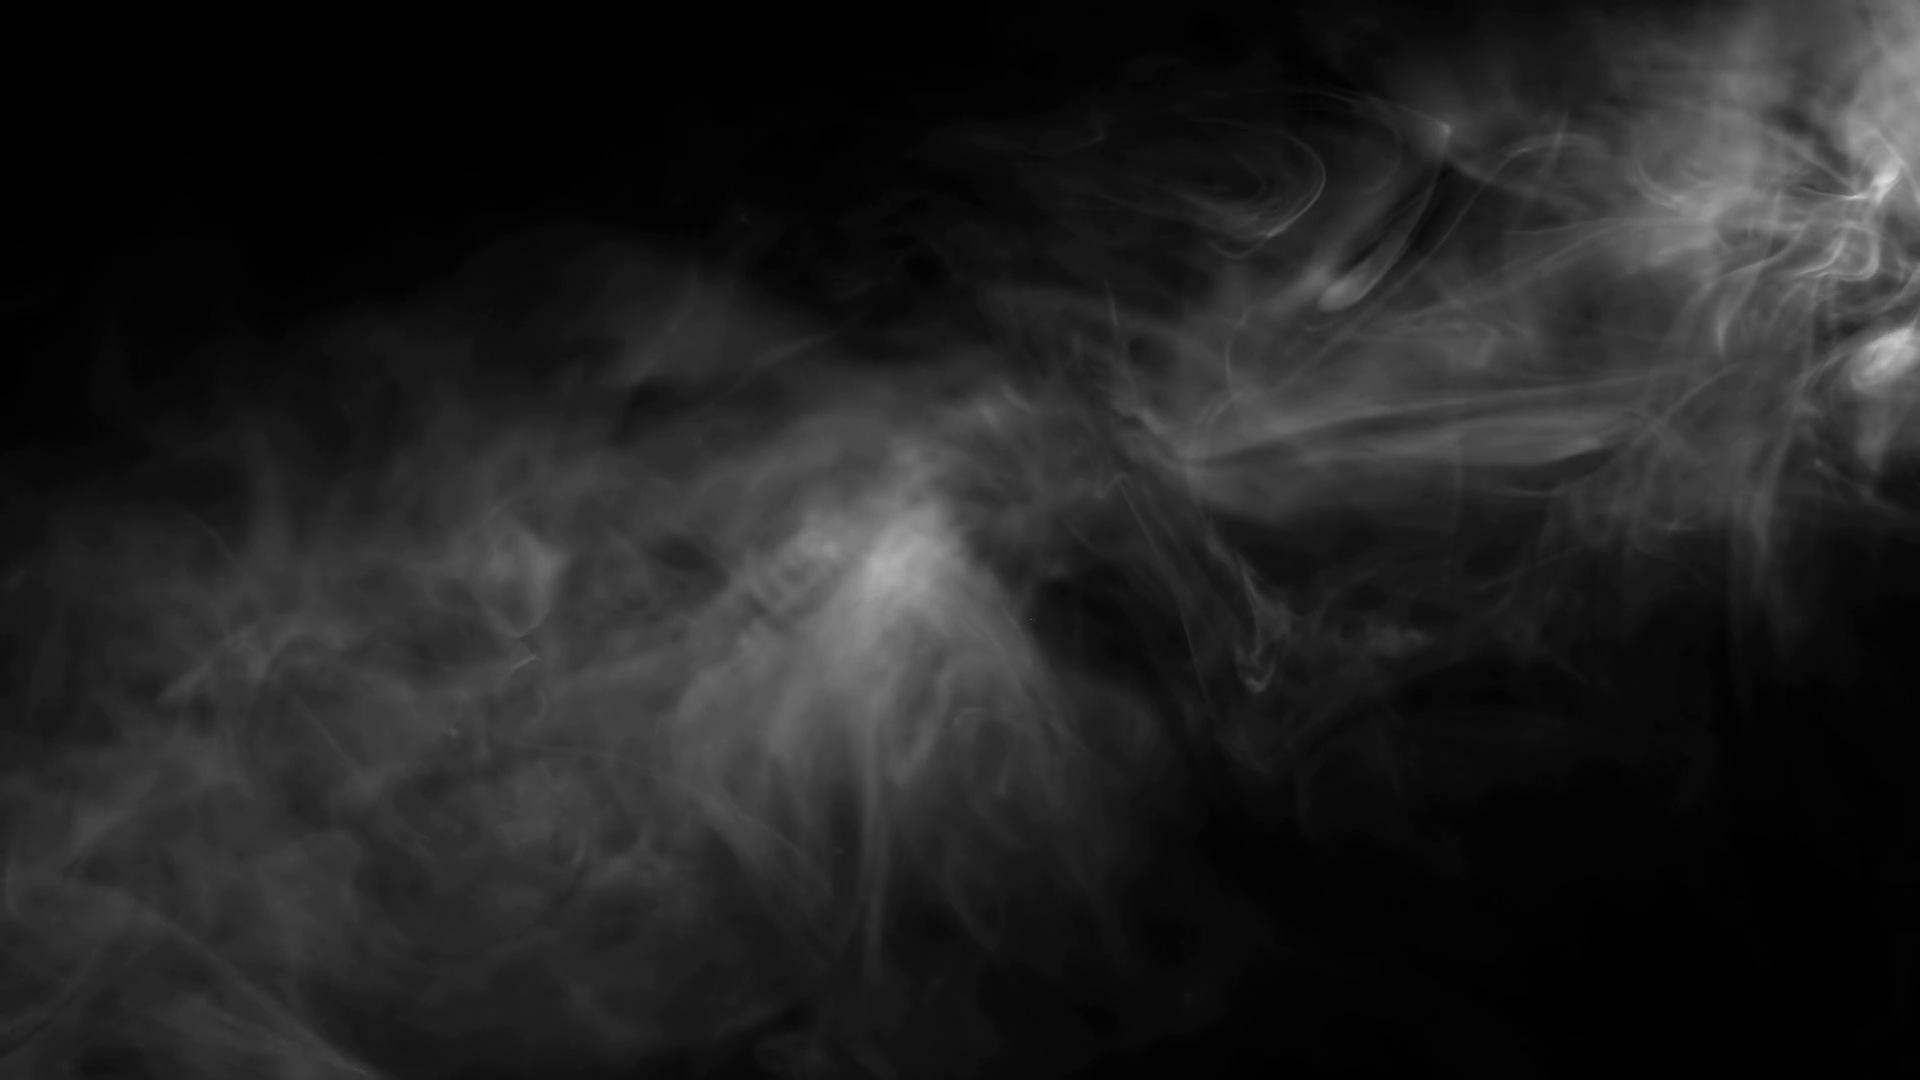 Smoke by Joana de Melo